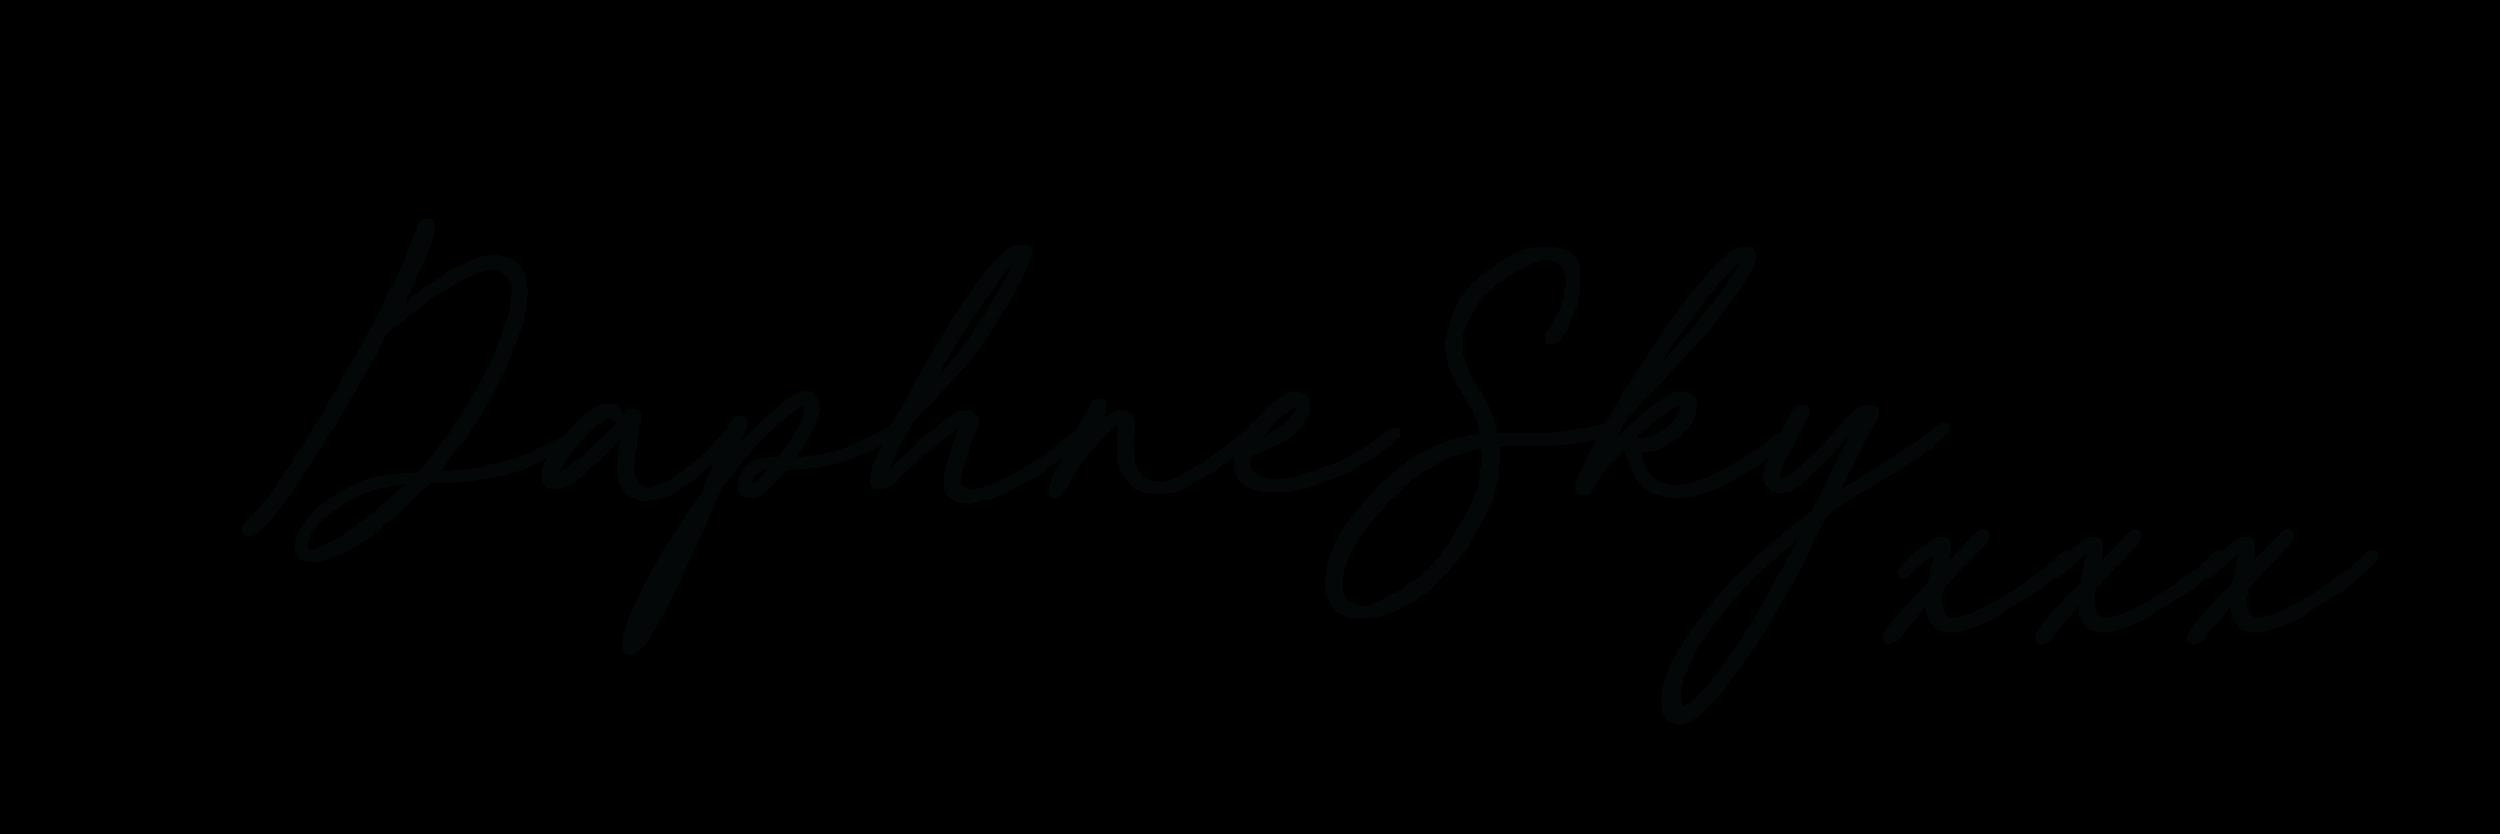 daphne_final_Signature 1.png